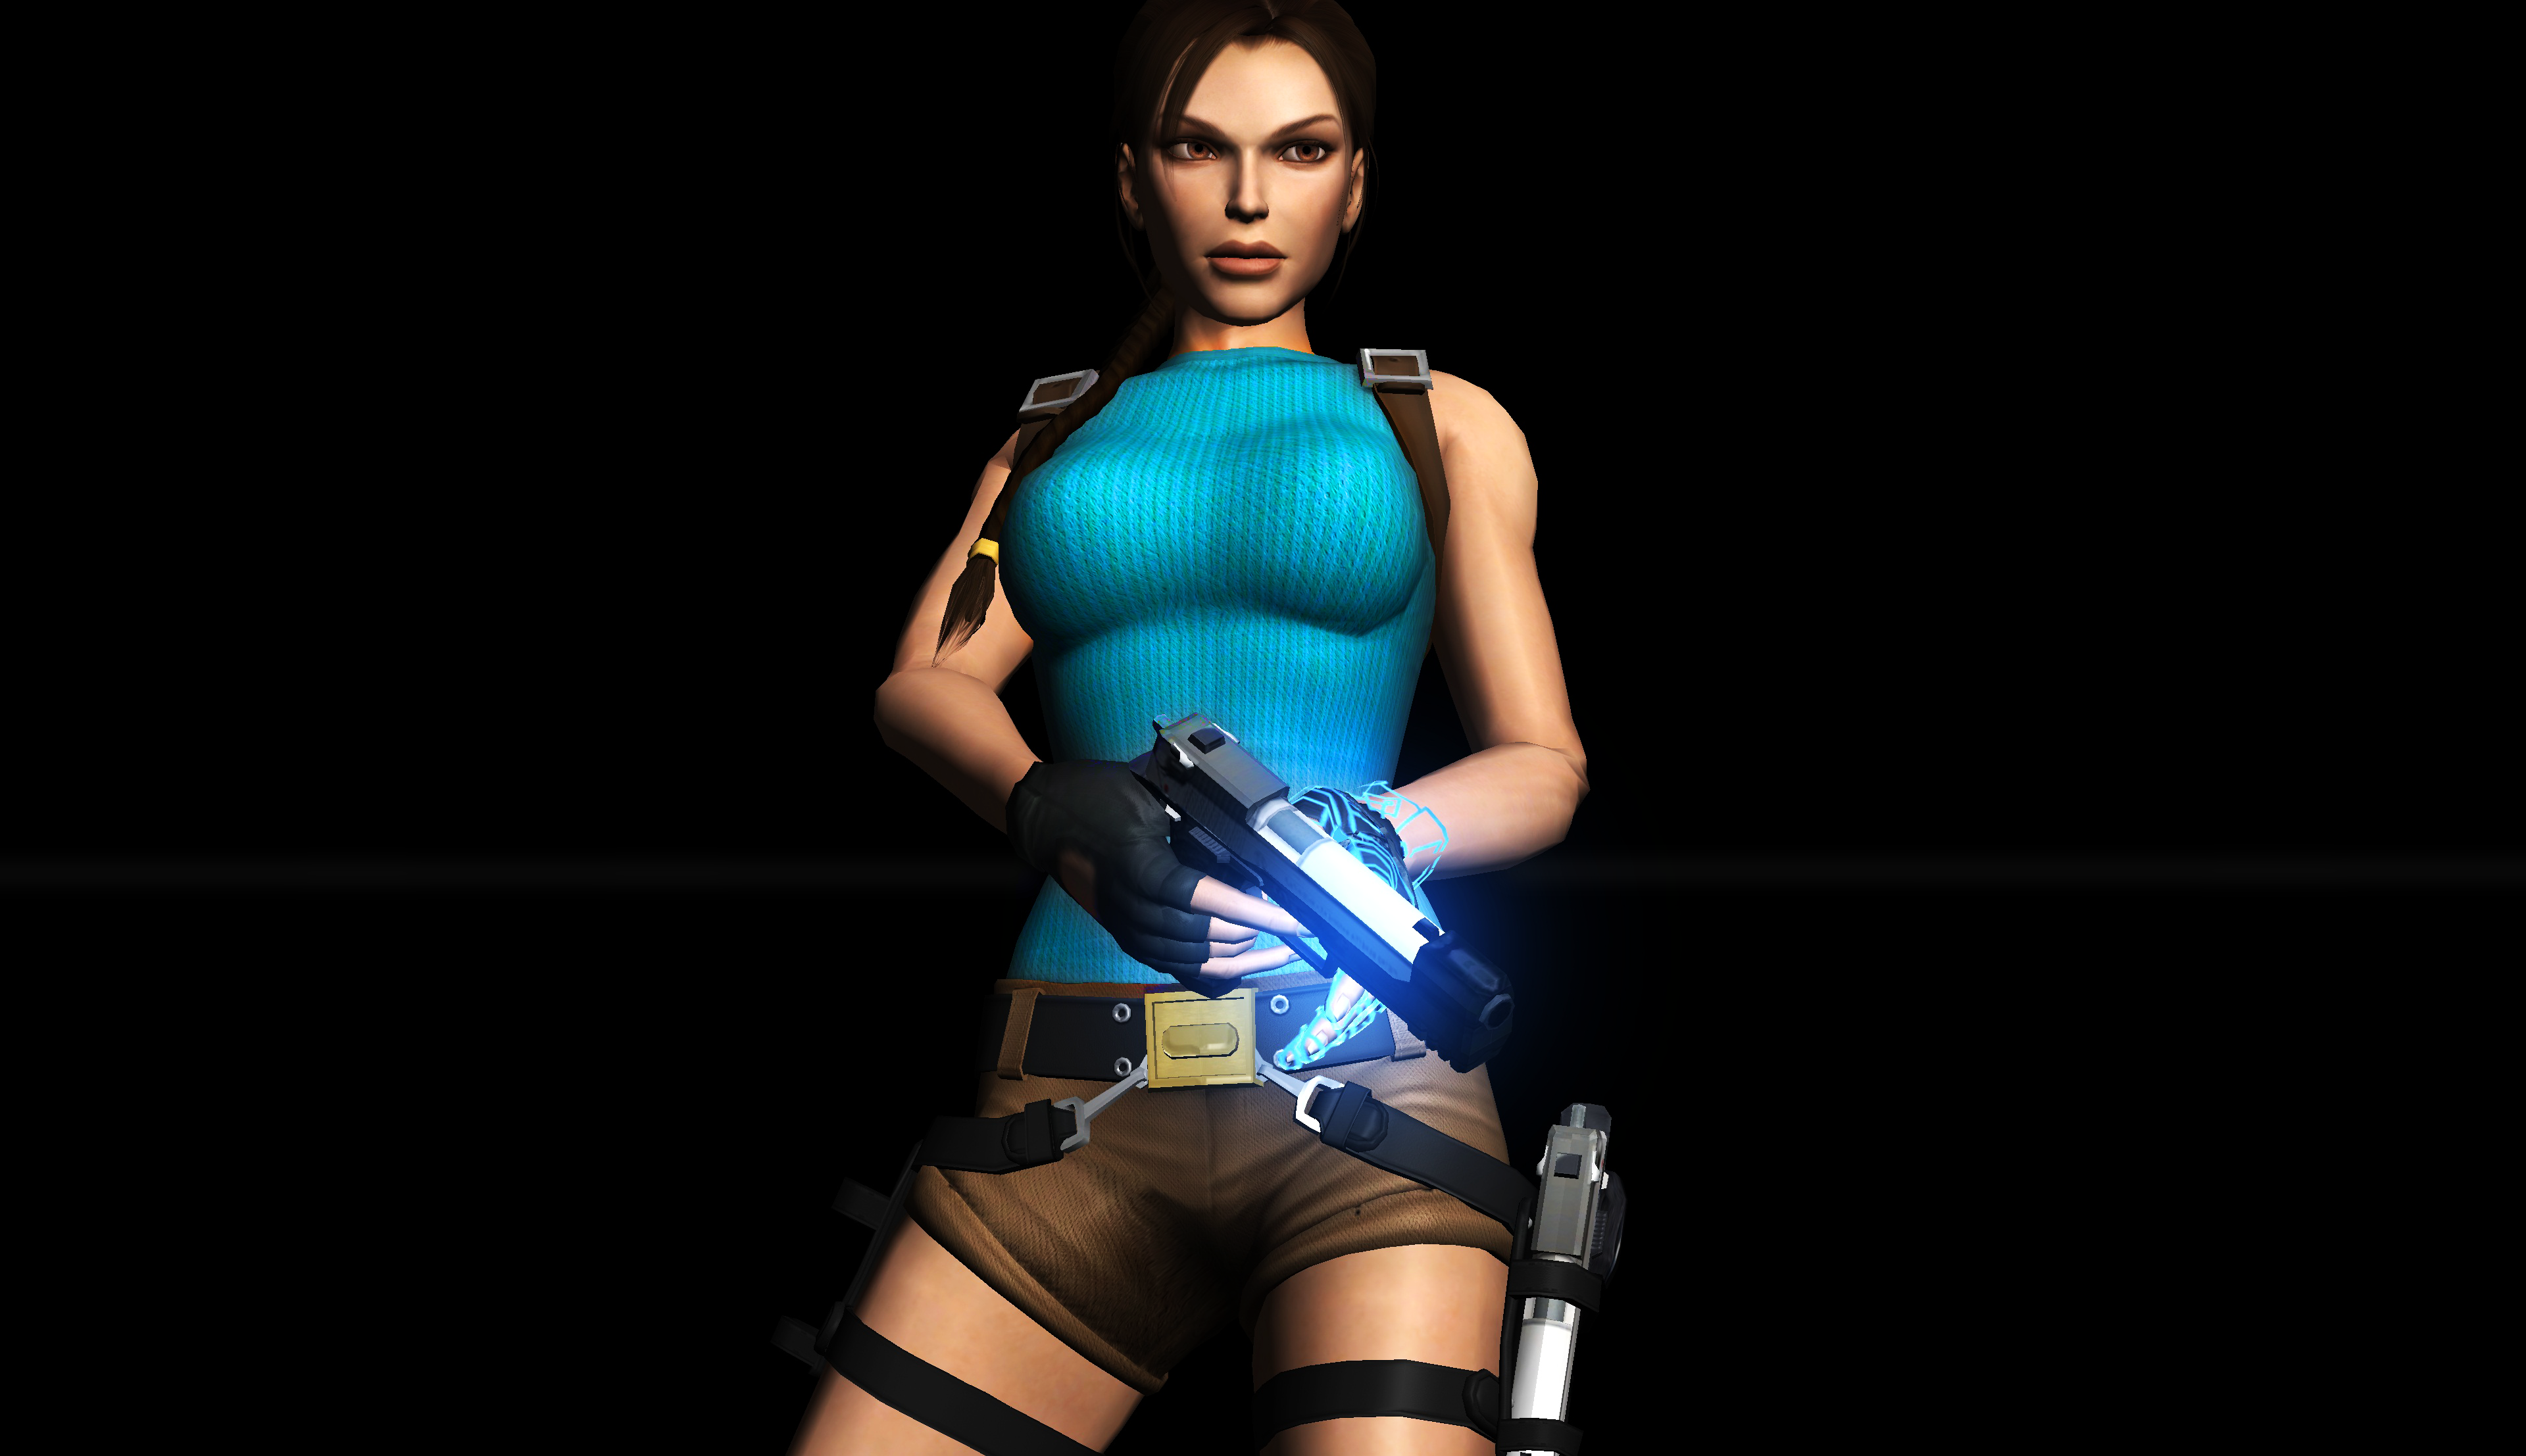 Lara Stand Pose with 1 Gun by Rockeeterl